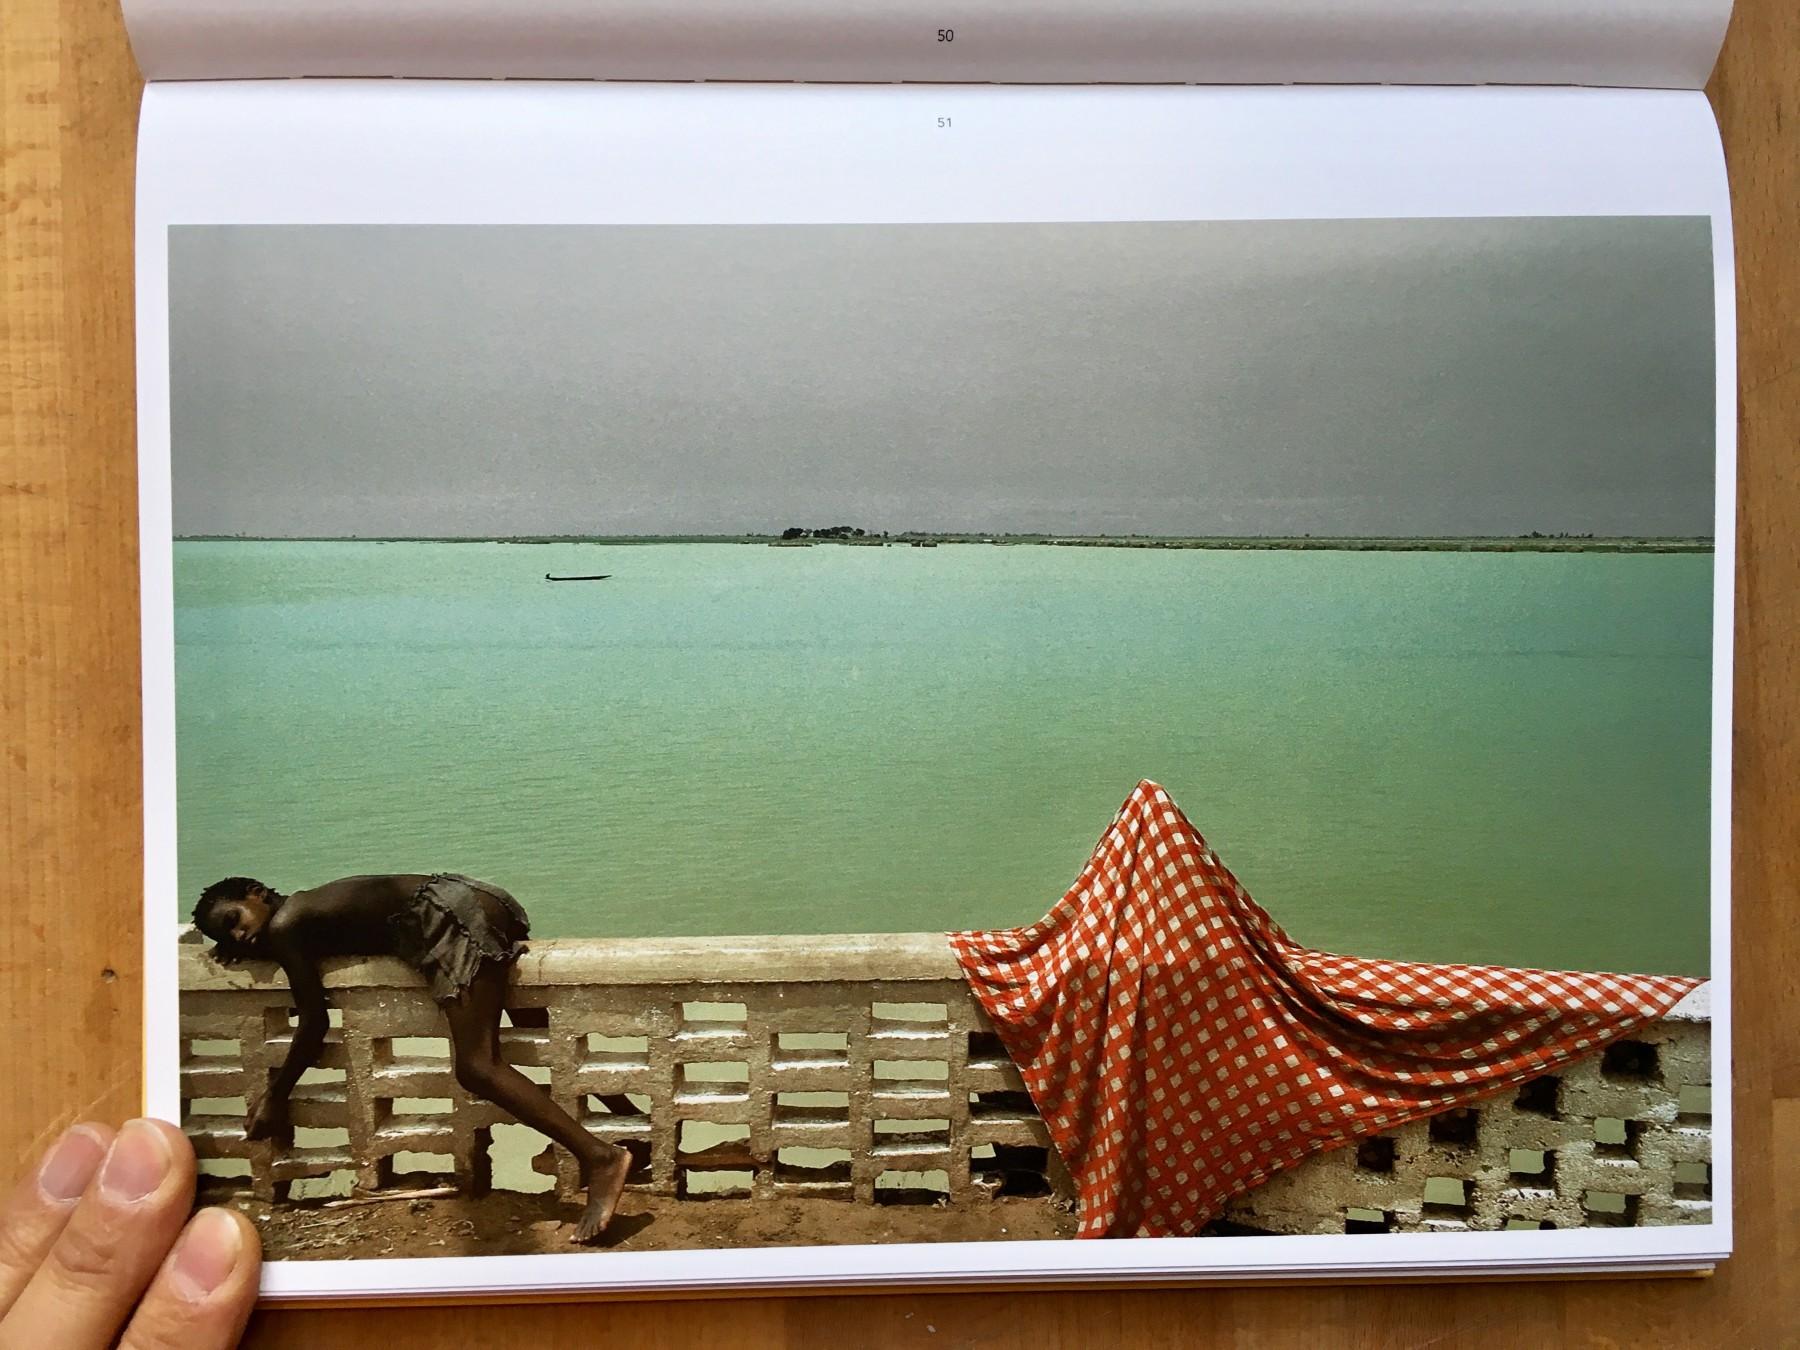 enster-blog-di-cultura-fotografica-harry-gruyaert-rivage-109.JPG